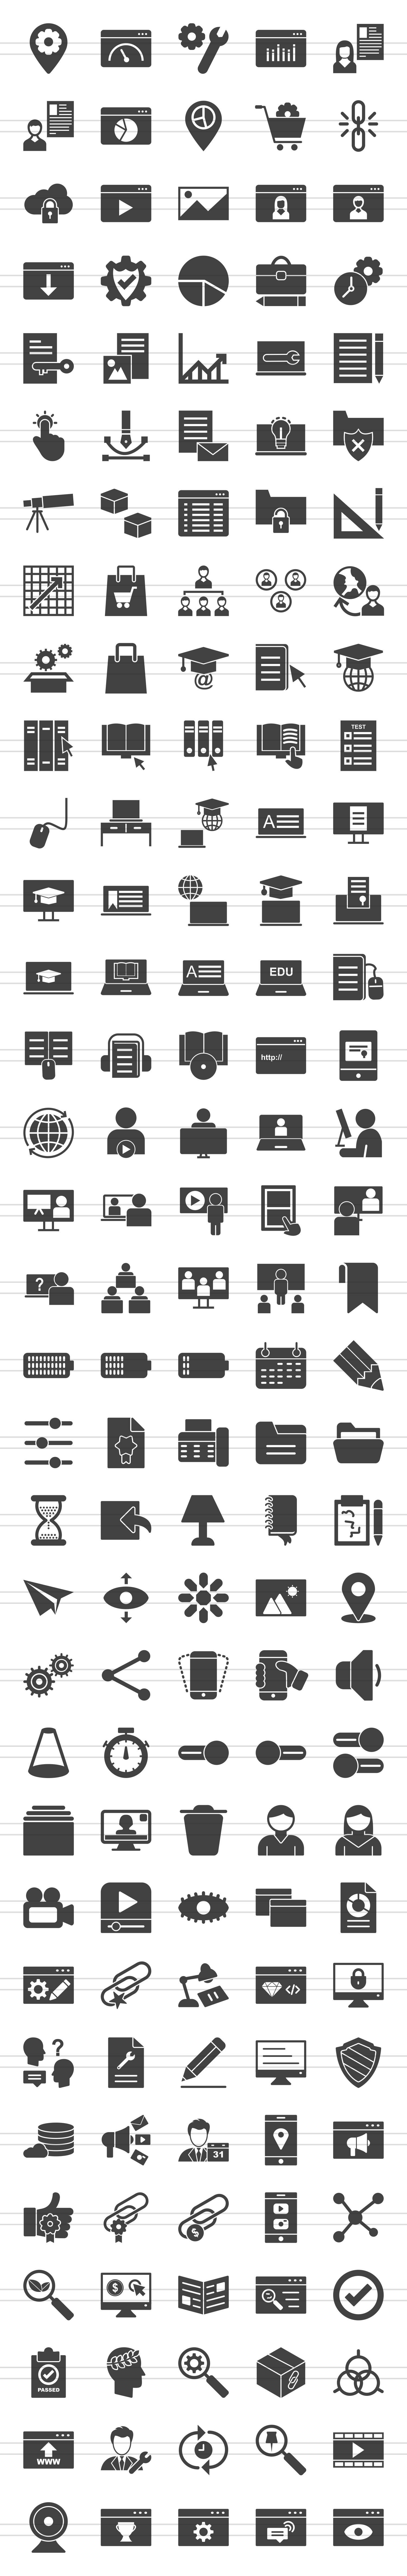 166 Web Glyph Icons example image 2